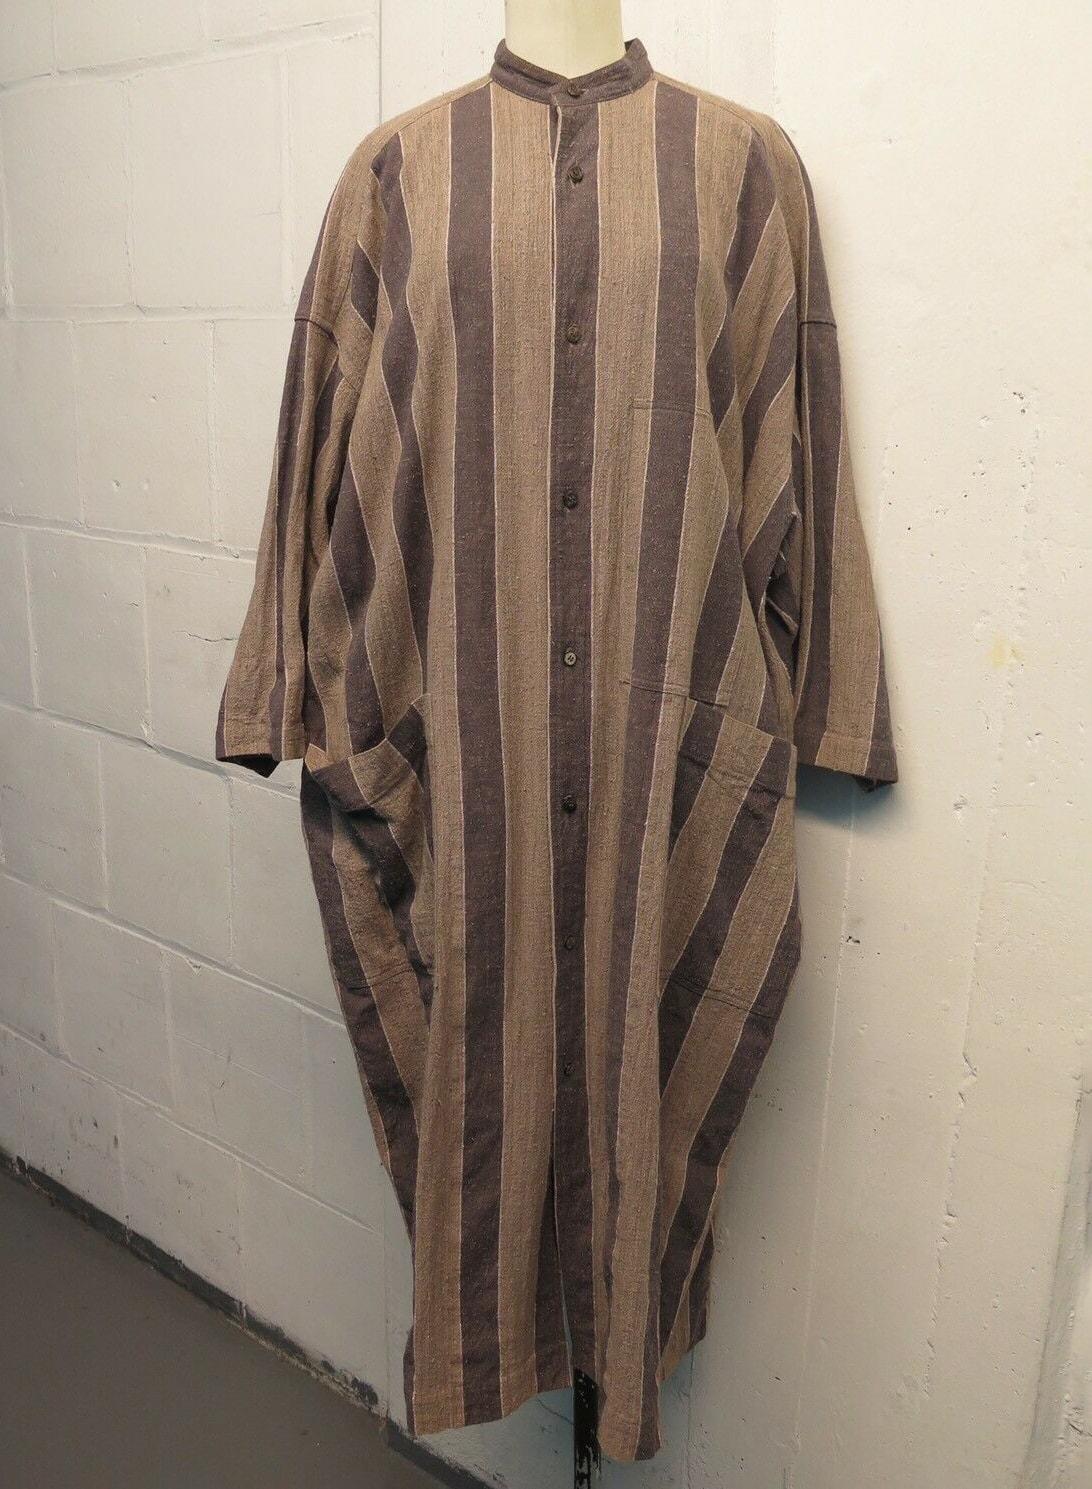 Plantation Issey Miyake Striped Duster Tunic Sz M